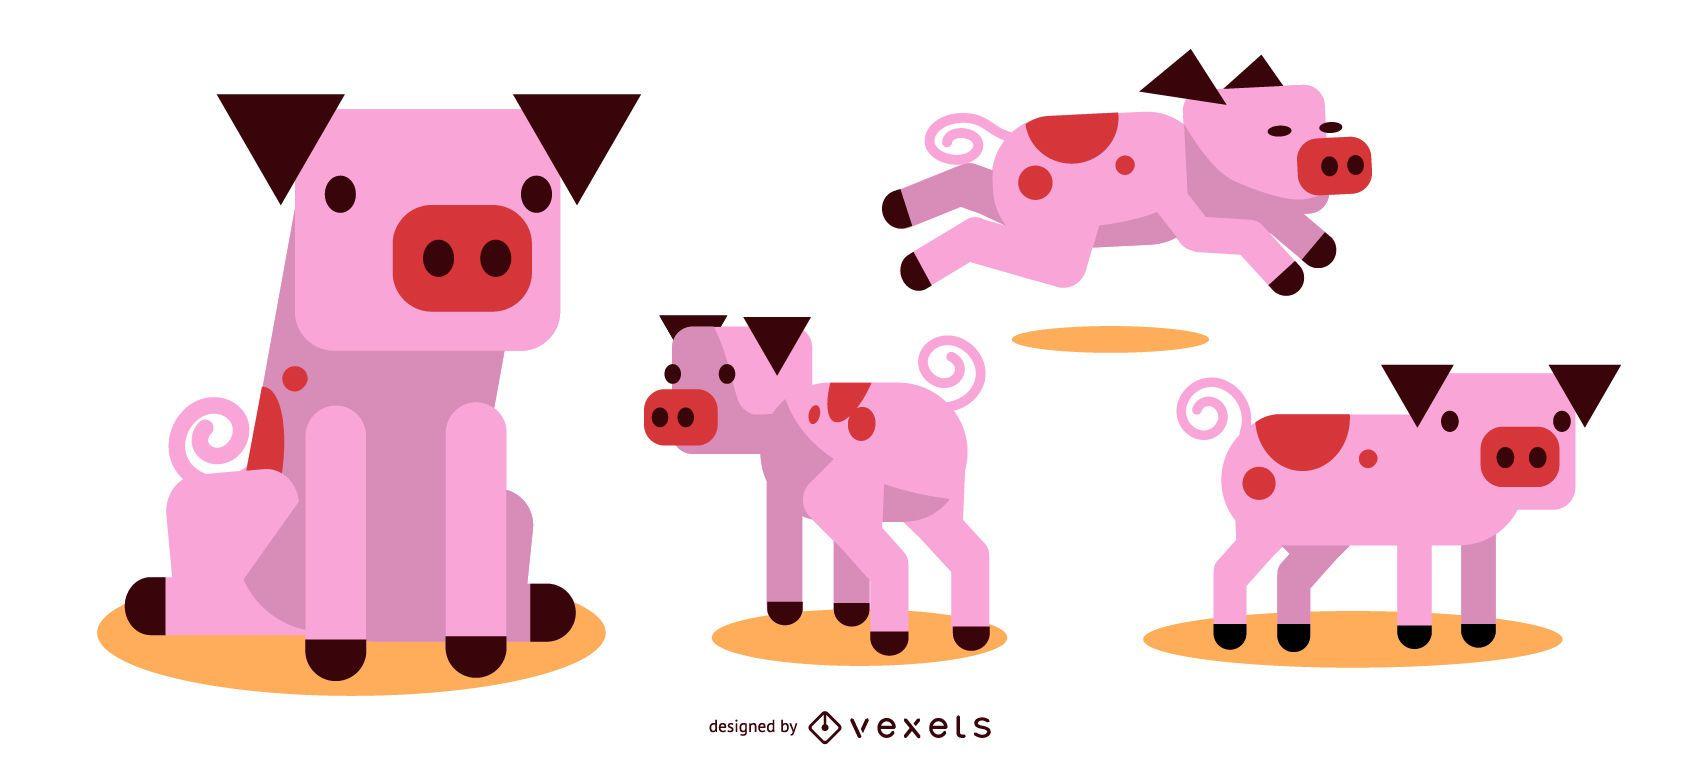 Pig Rounded Flat Geometric Design